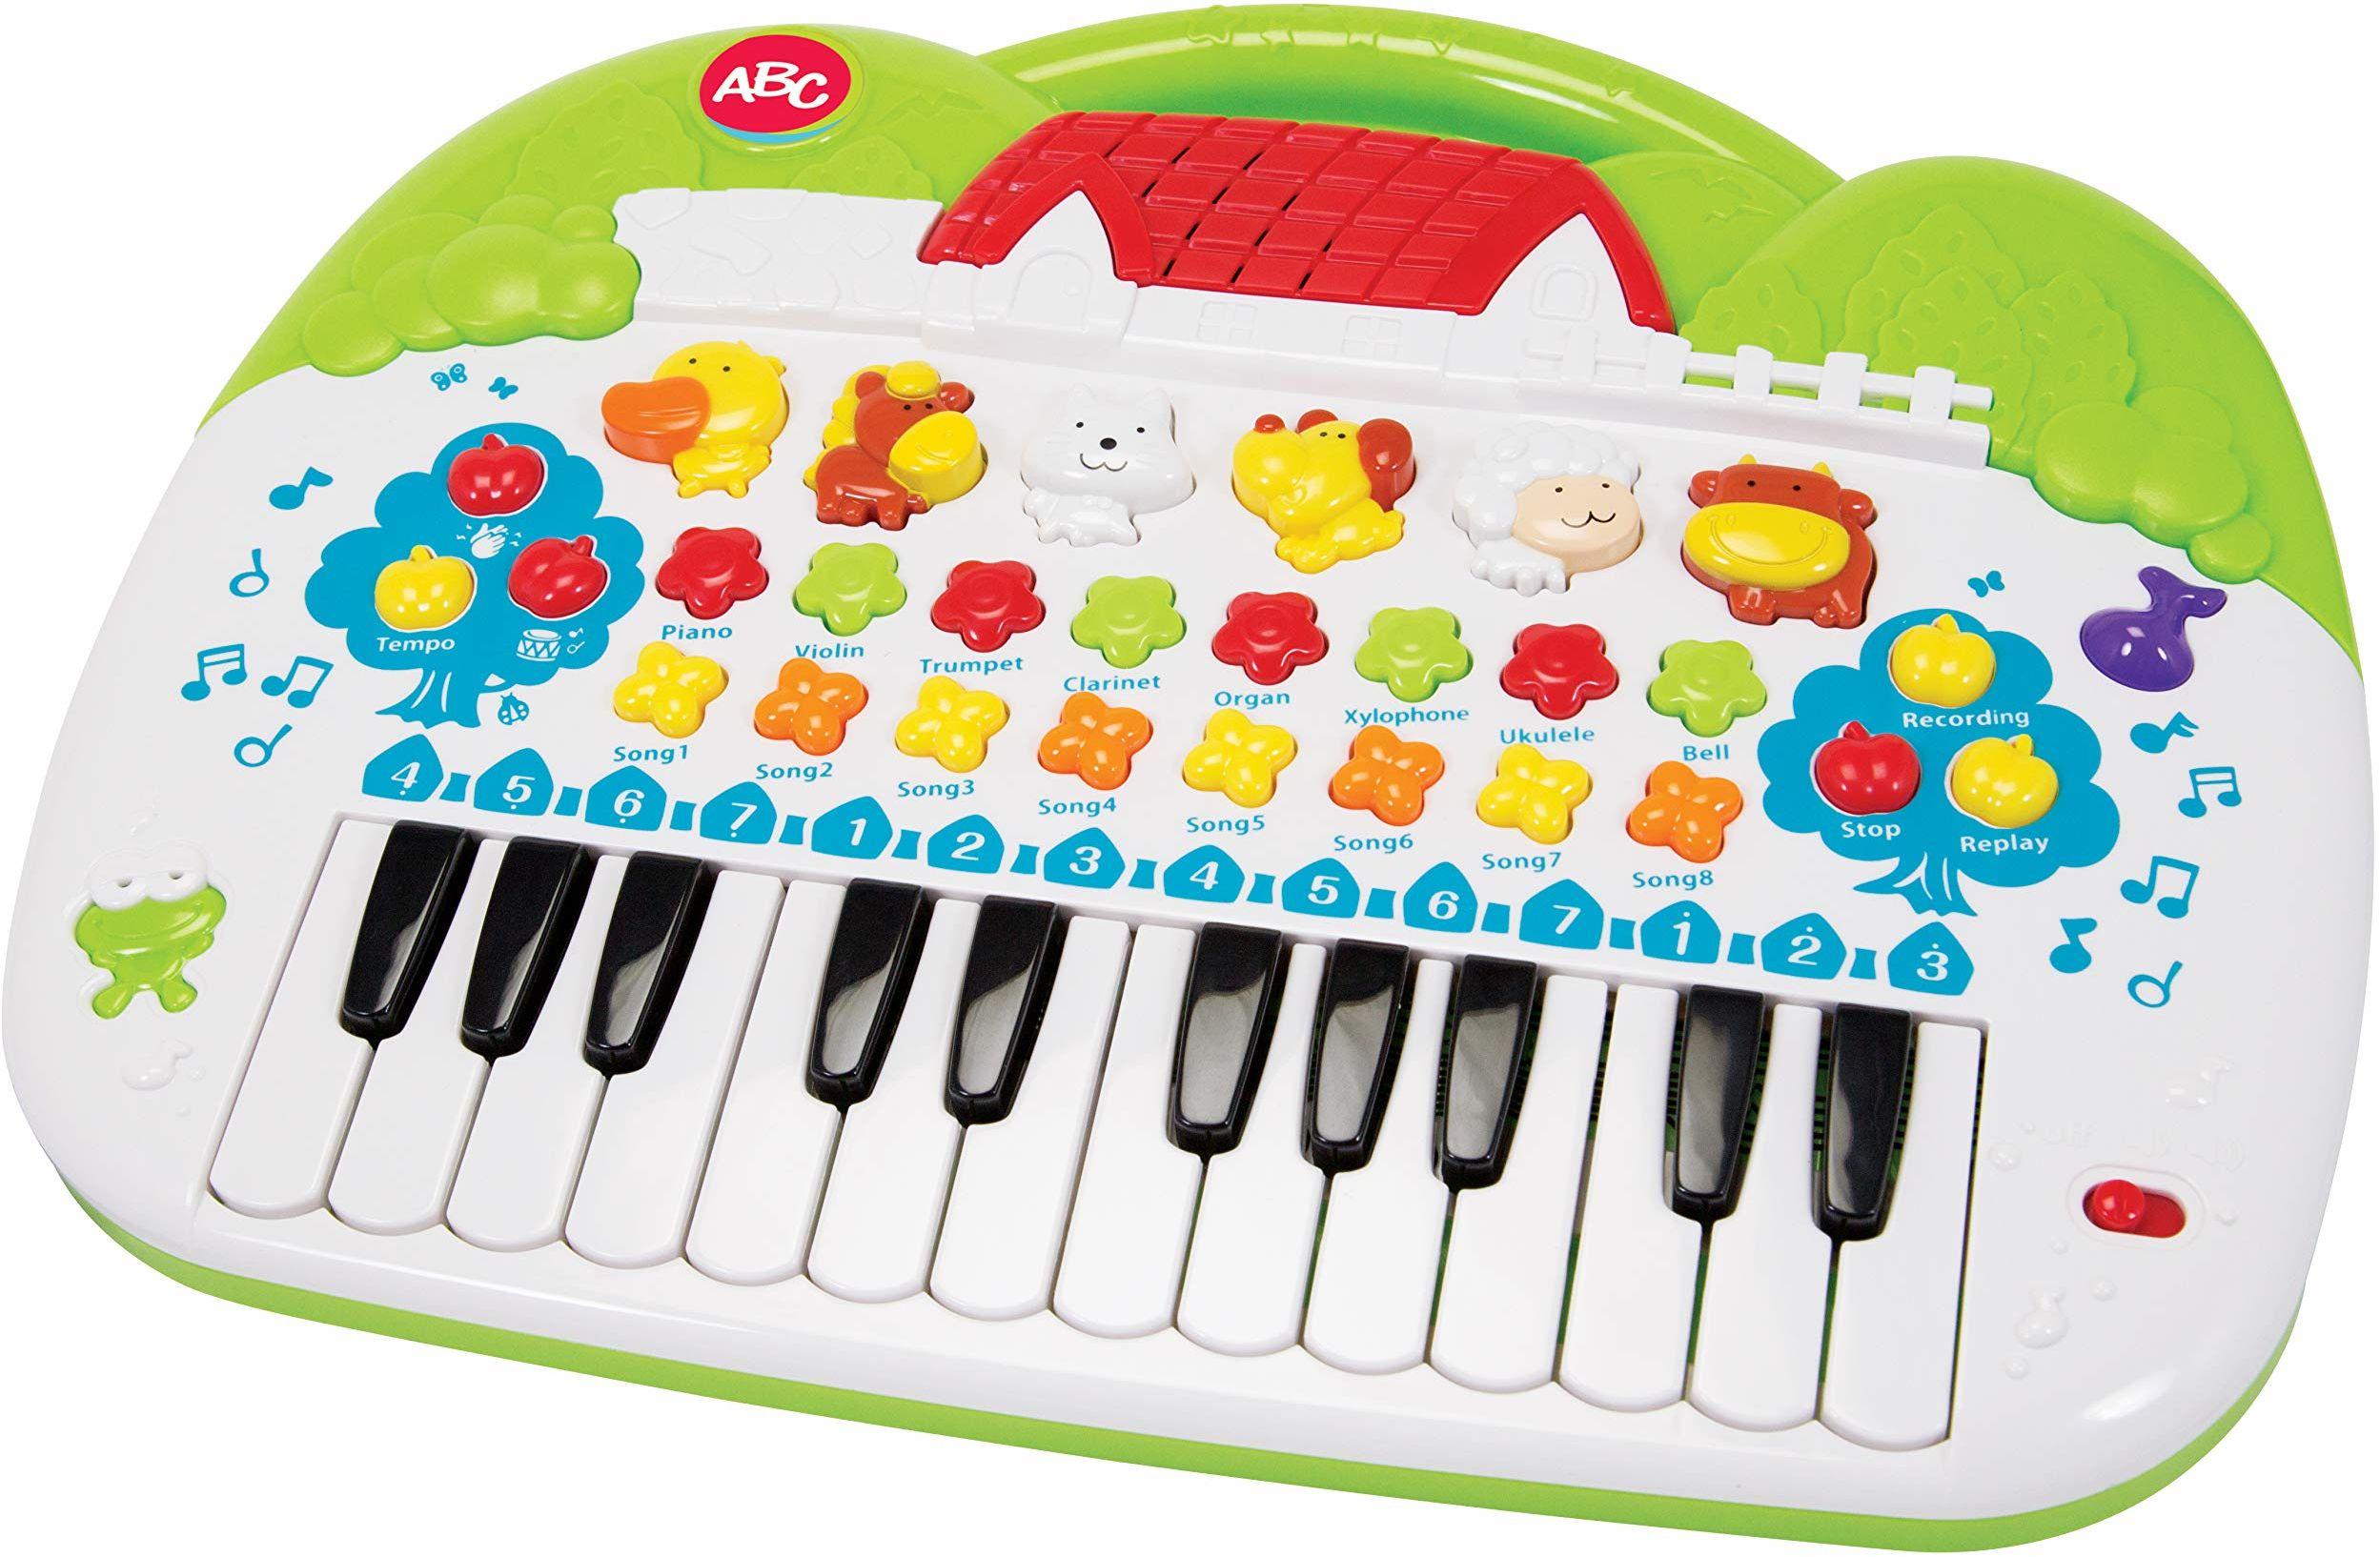 Simba 104018188 - ABC keyboard 28 x 39 cm